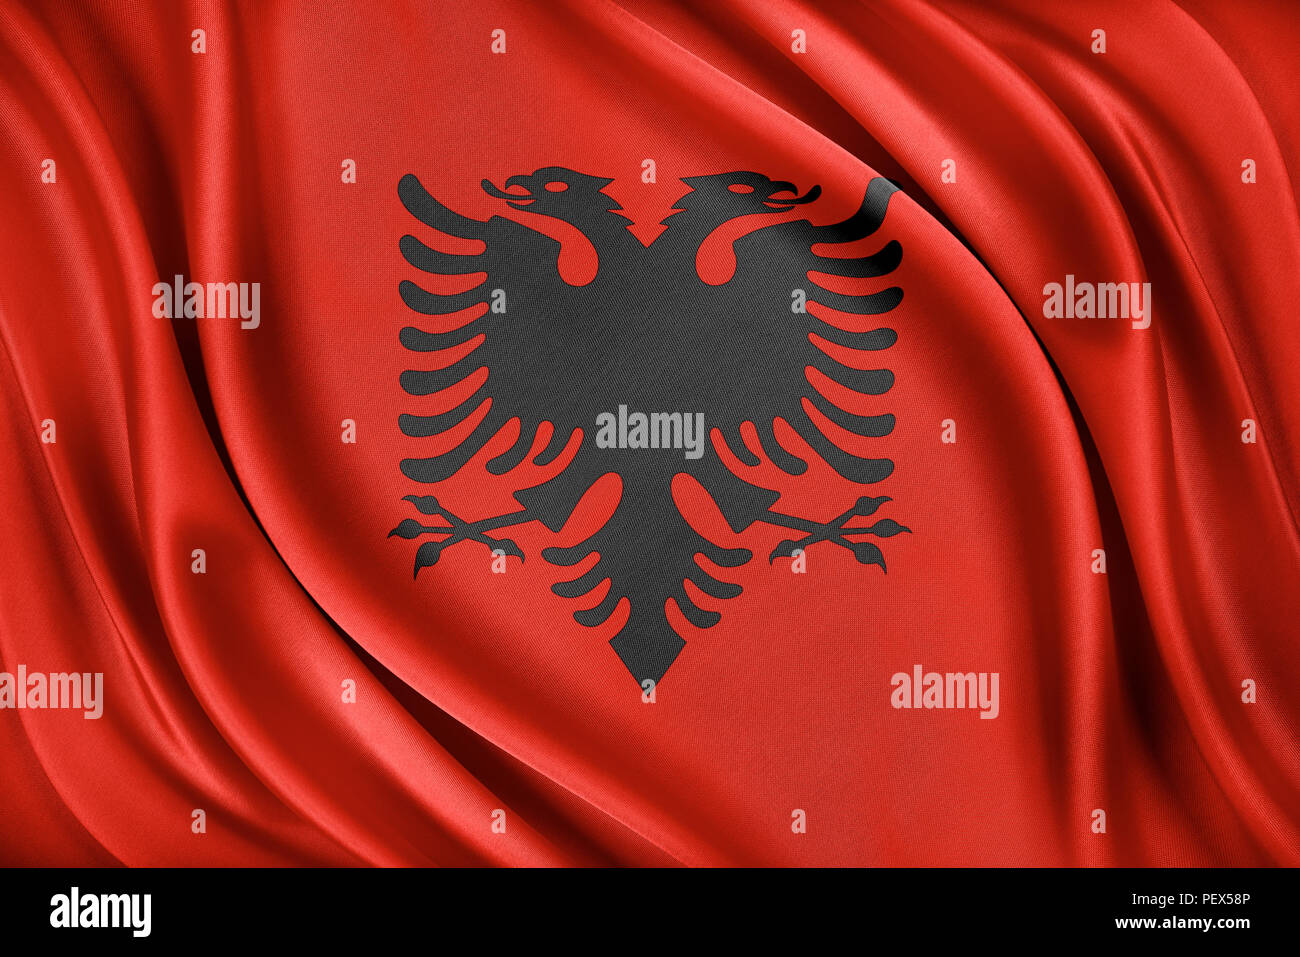 Albania flag. Flag with a glossy silk texture. - Stock Image